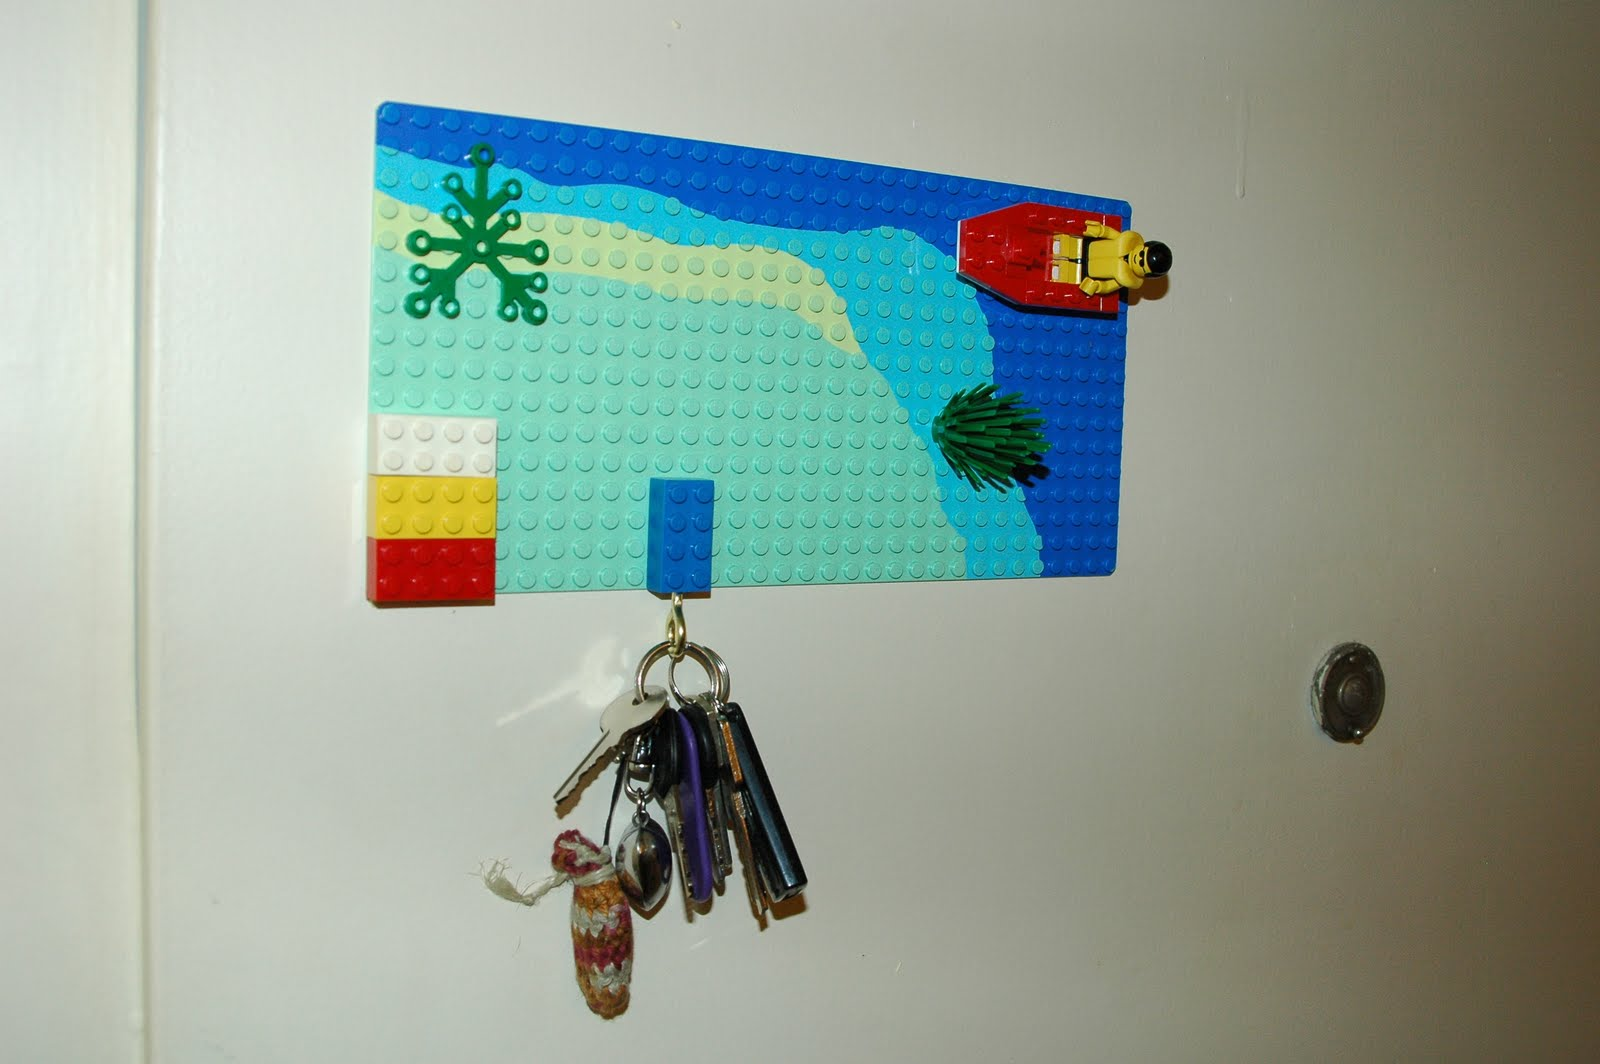 cologniart: selfmade lego-schlüsselbrett